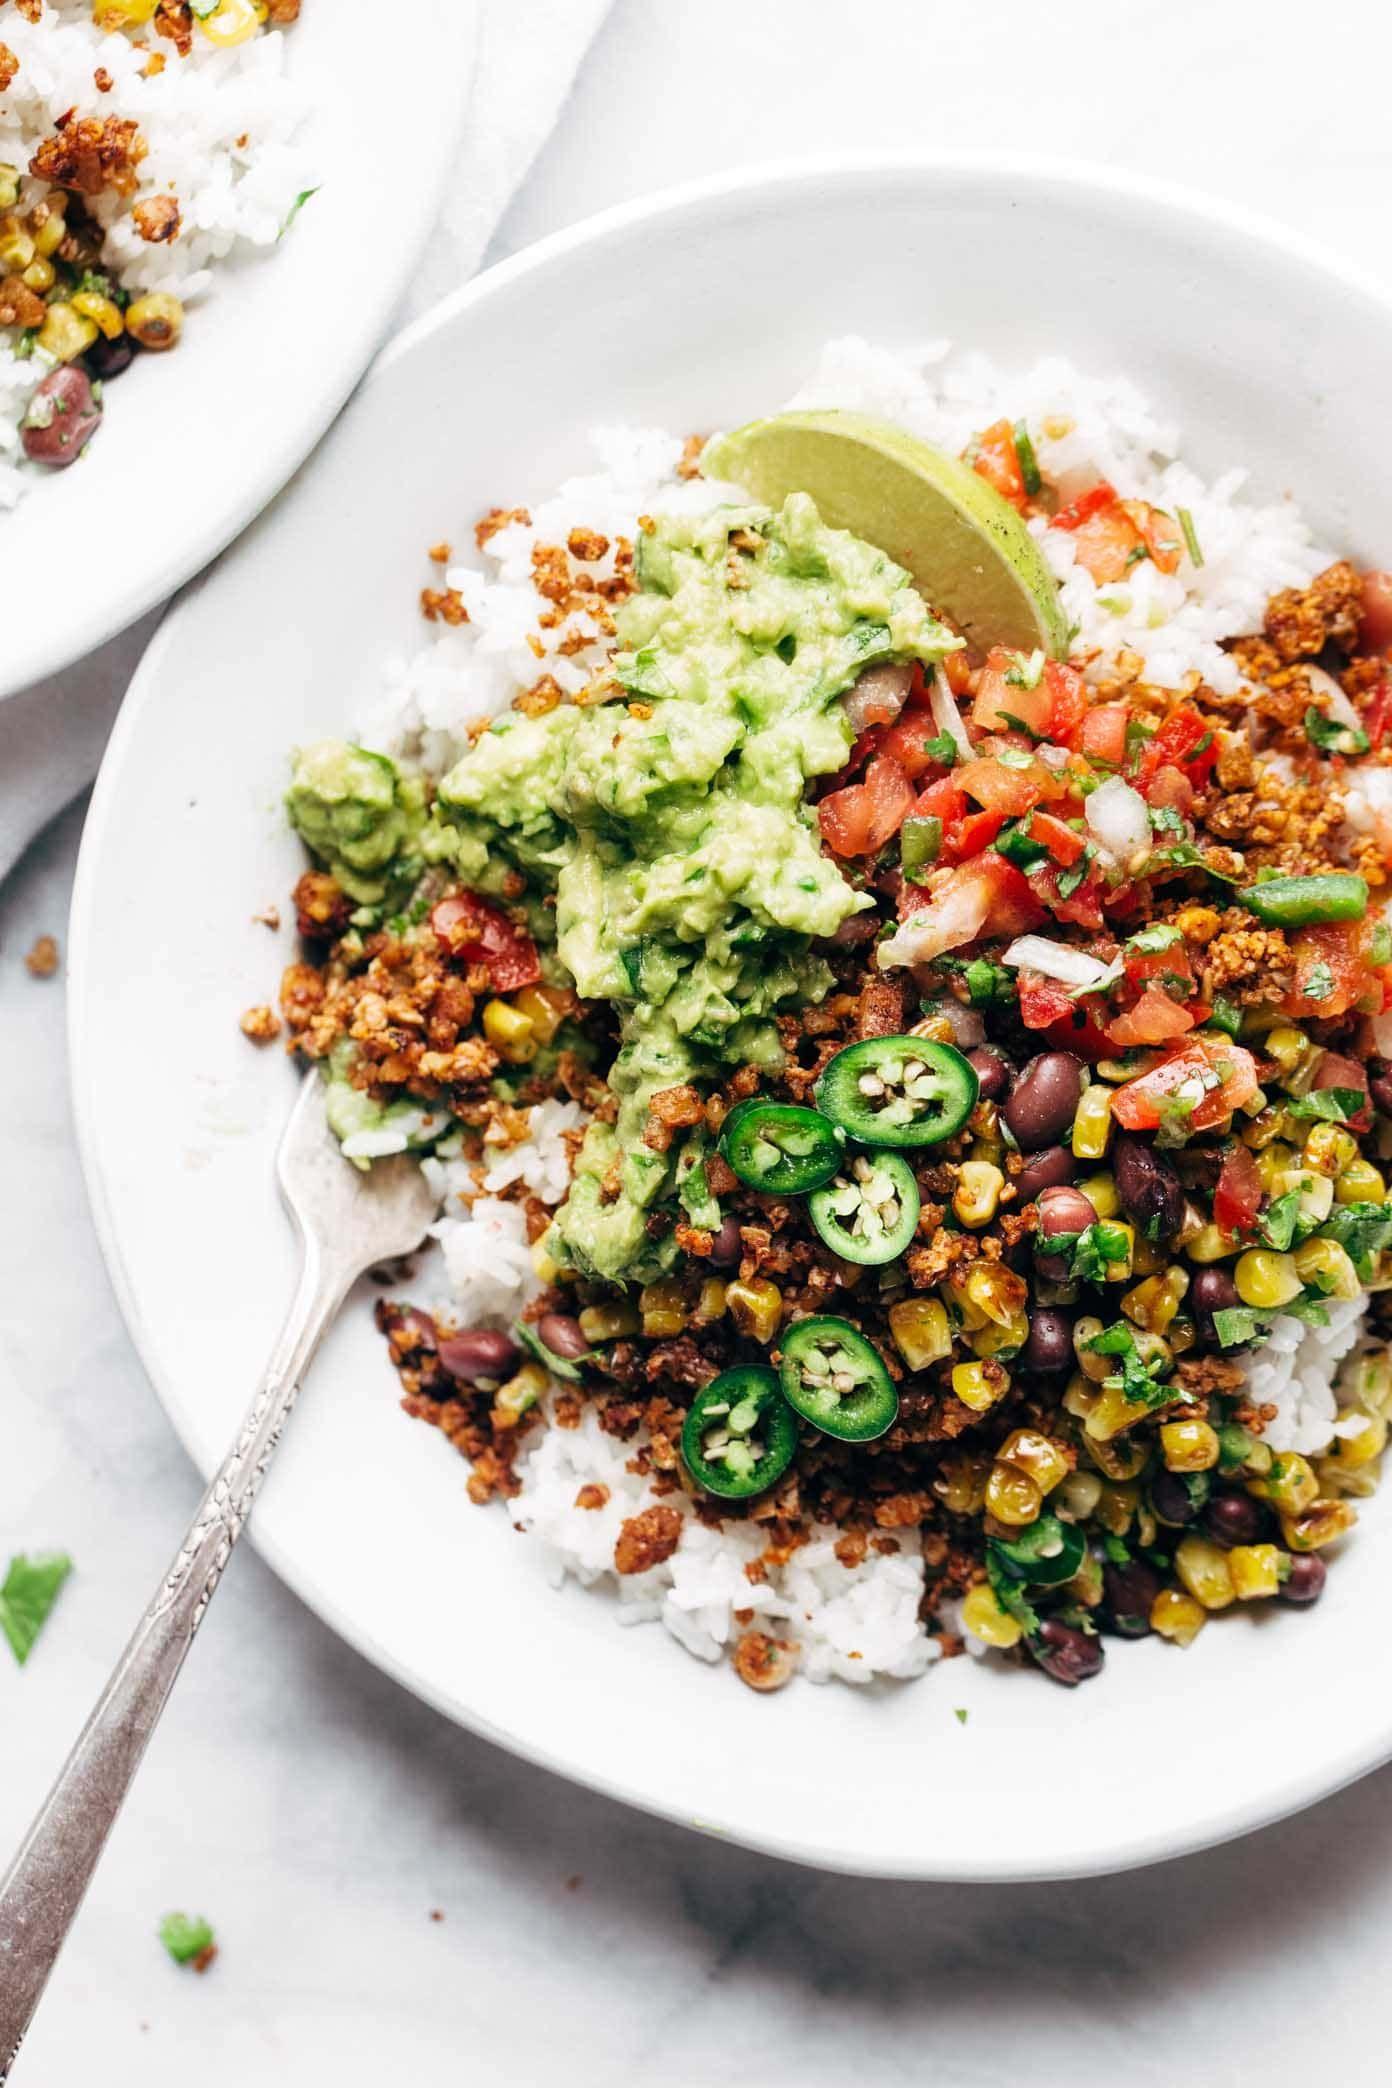 Cauliflower Walnut Taco Meat Recipe High Protein Vegetarian